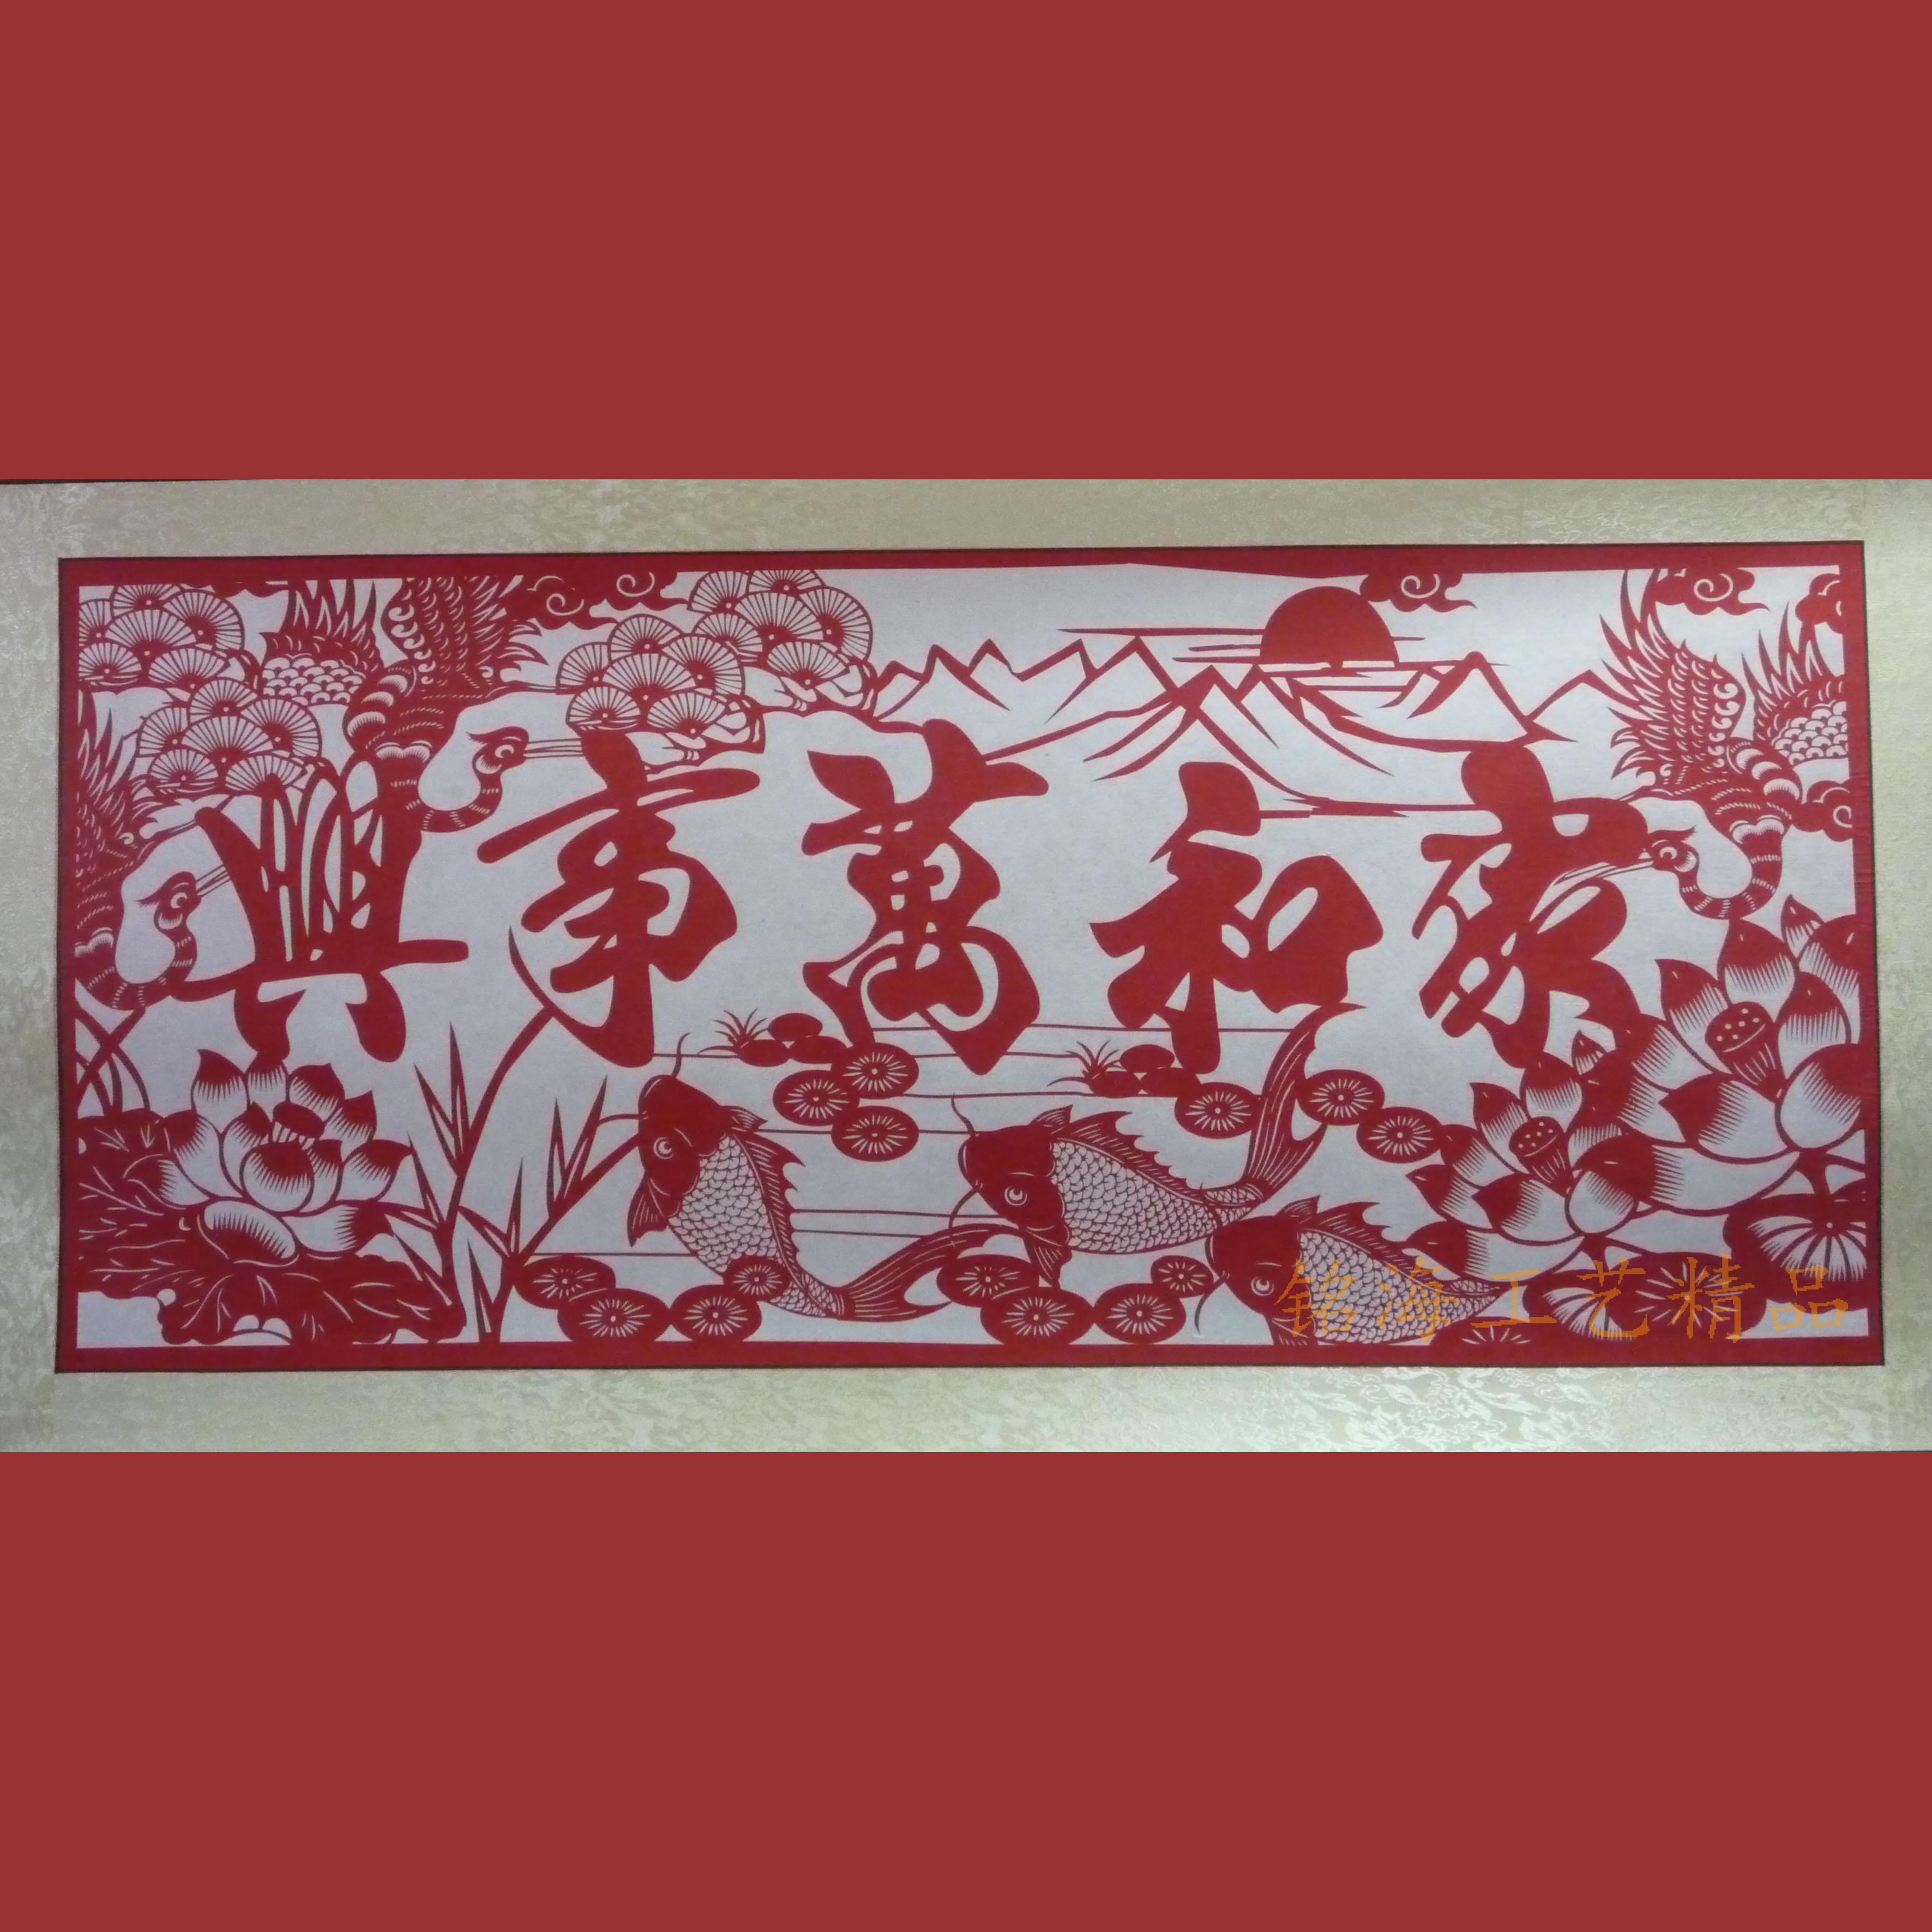 Этнический сувенир Ming Hai